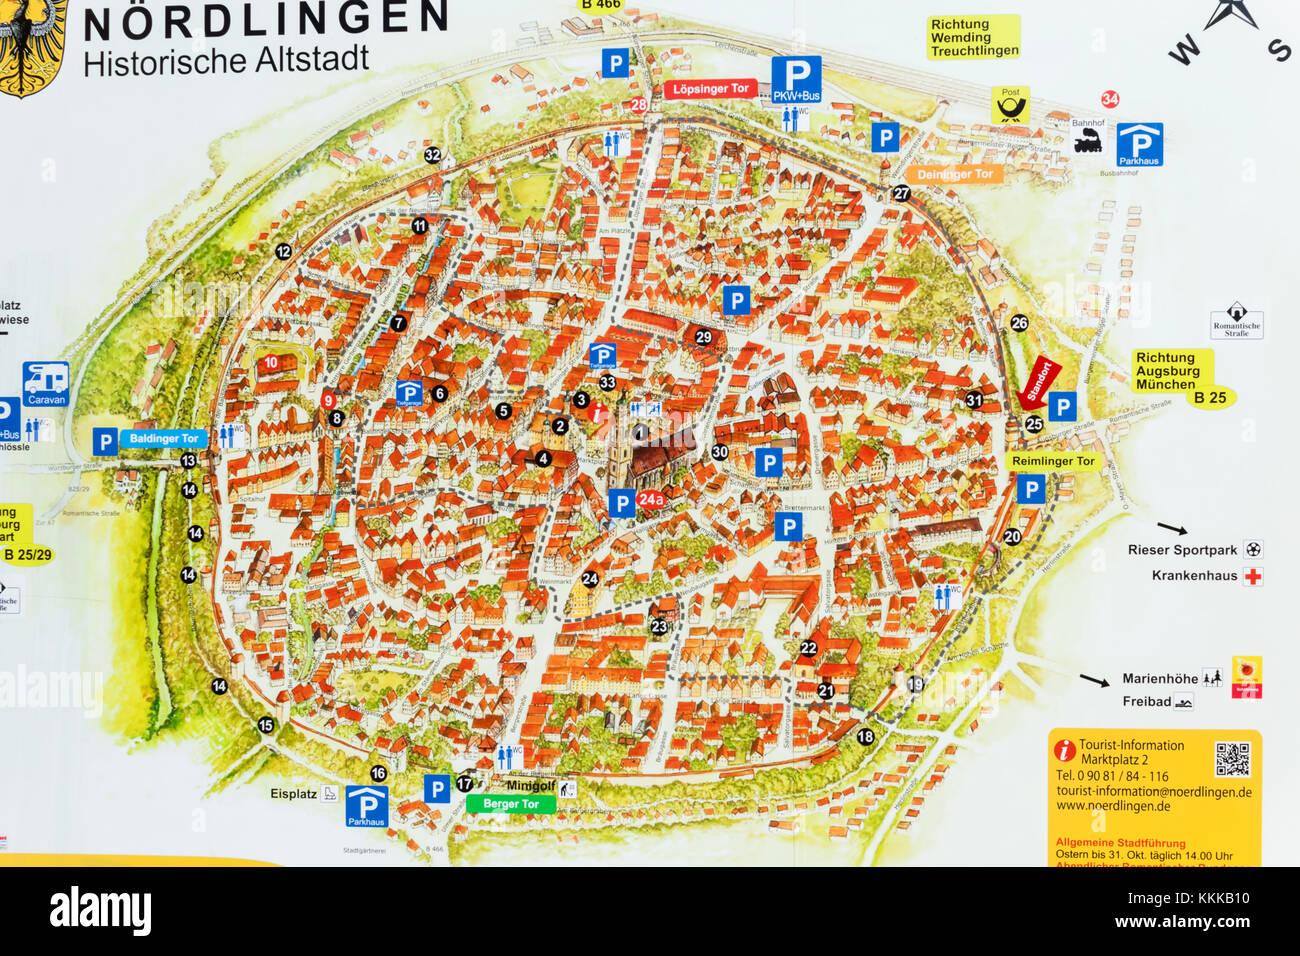 Germany Bavaria Romantic Road Nordlingen Nordlingen Street Map